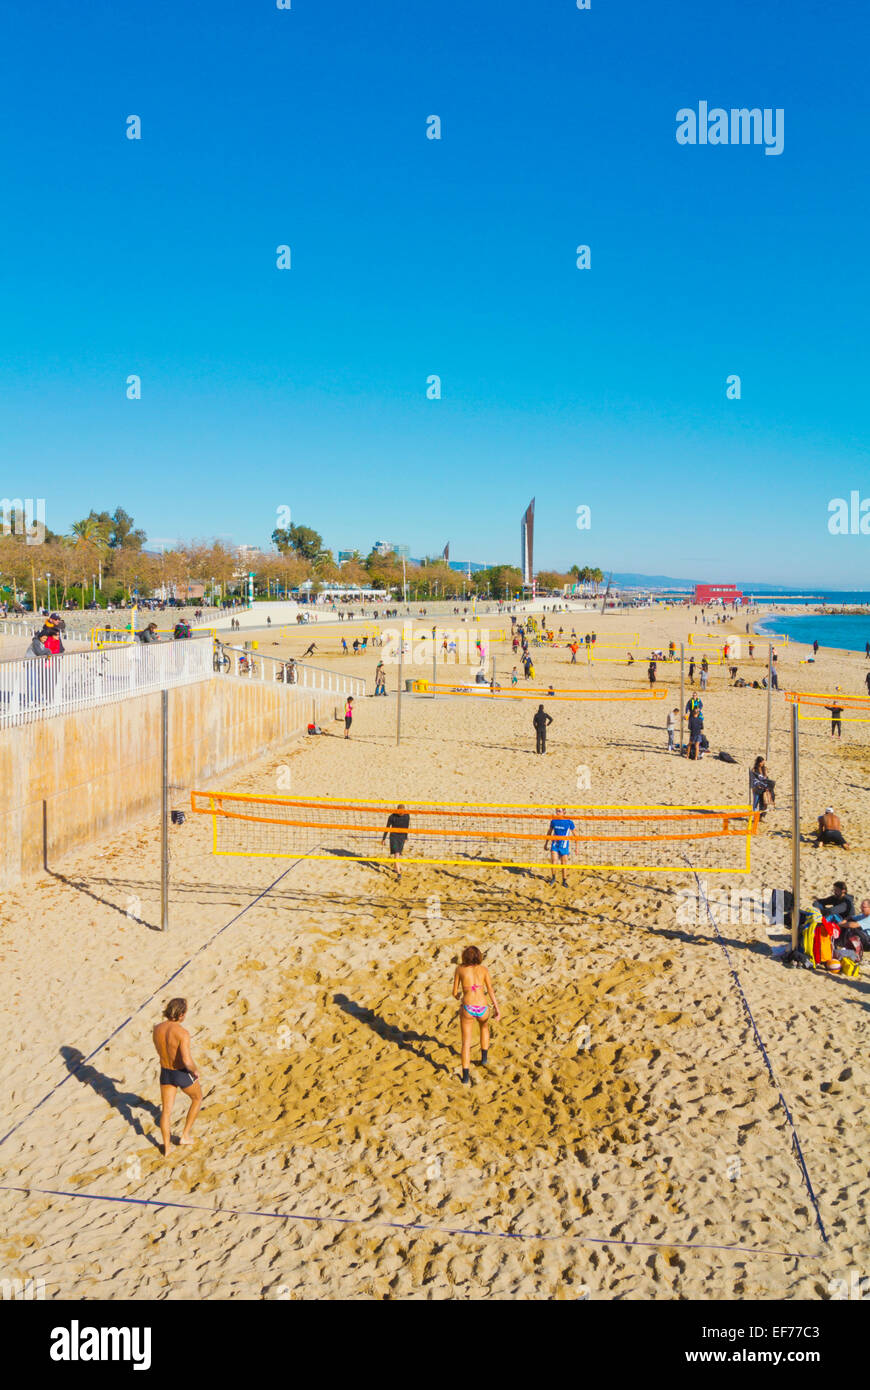 Beach-volley, plage Platja Nova Icaria, Barcelone, Espagne Photo Stock